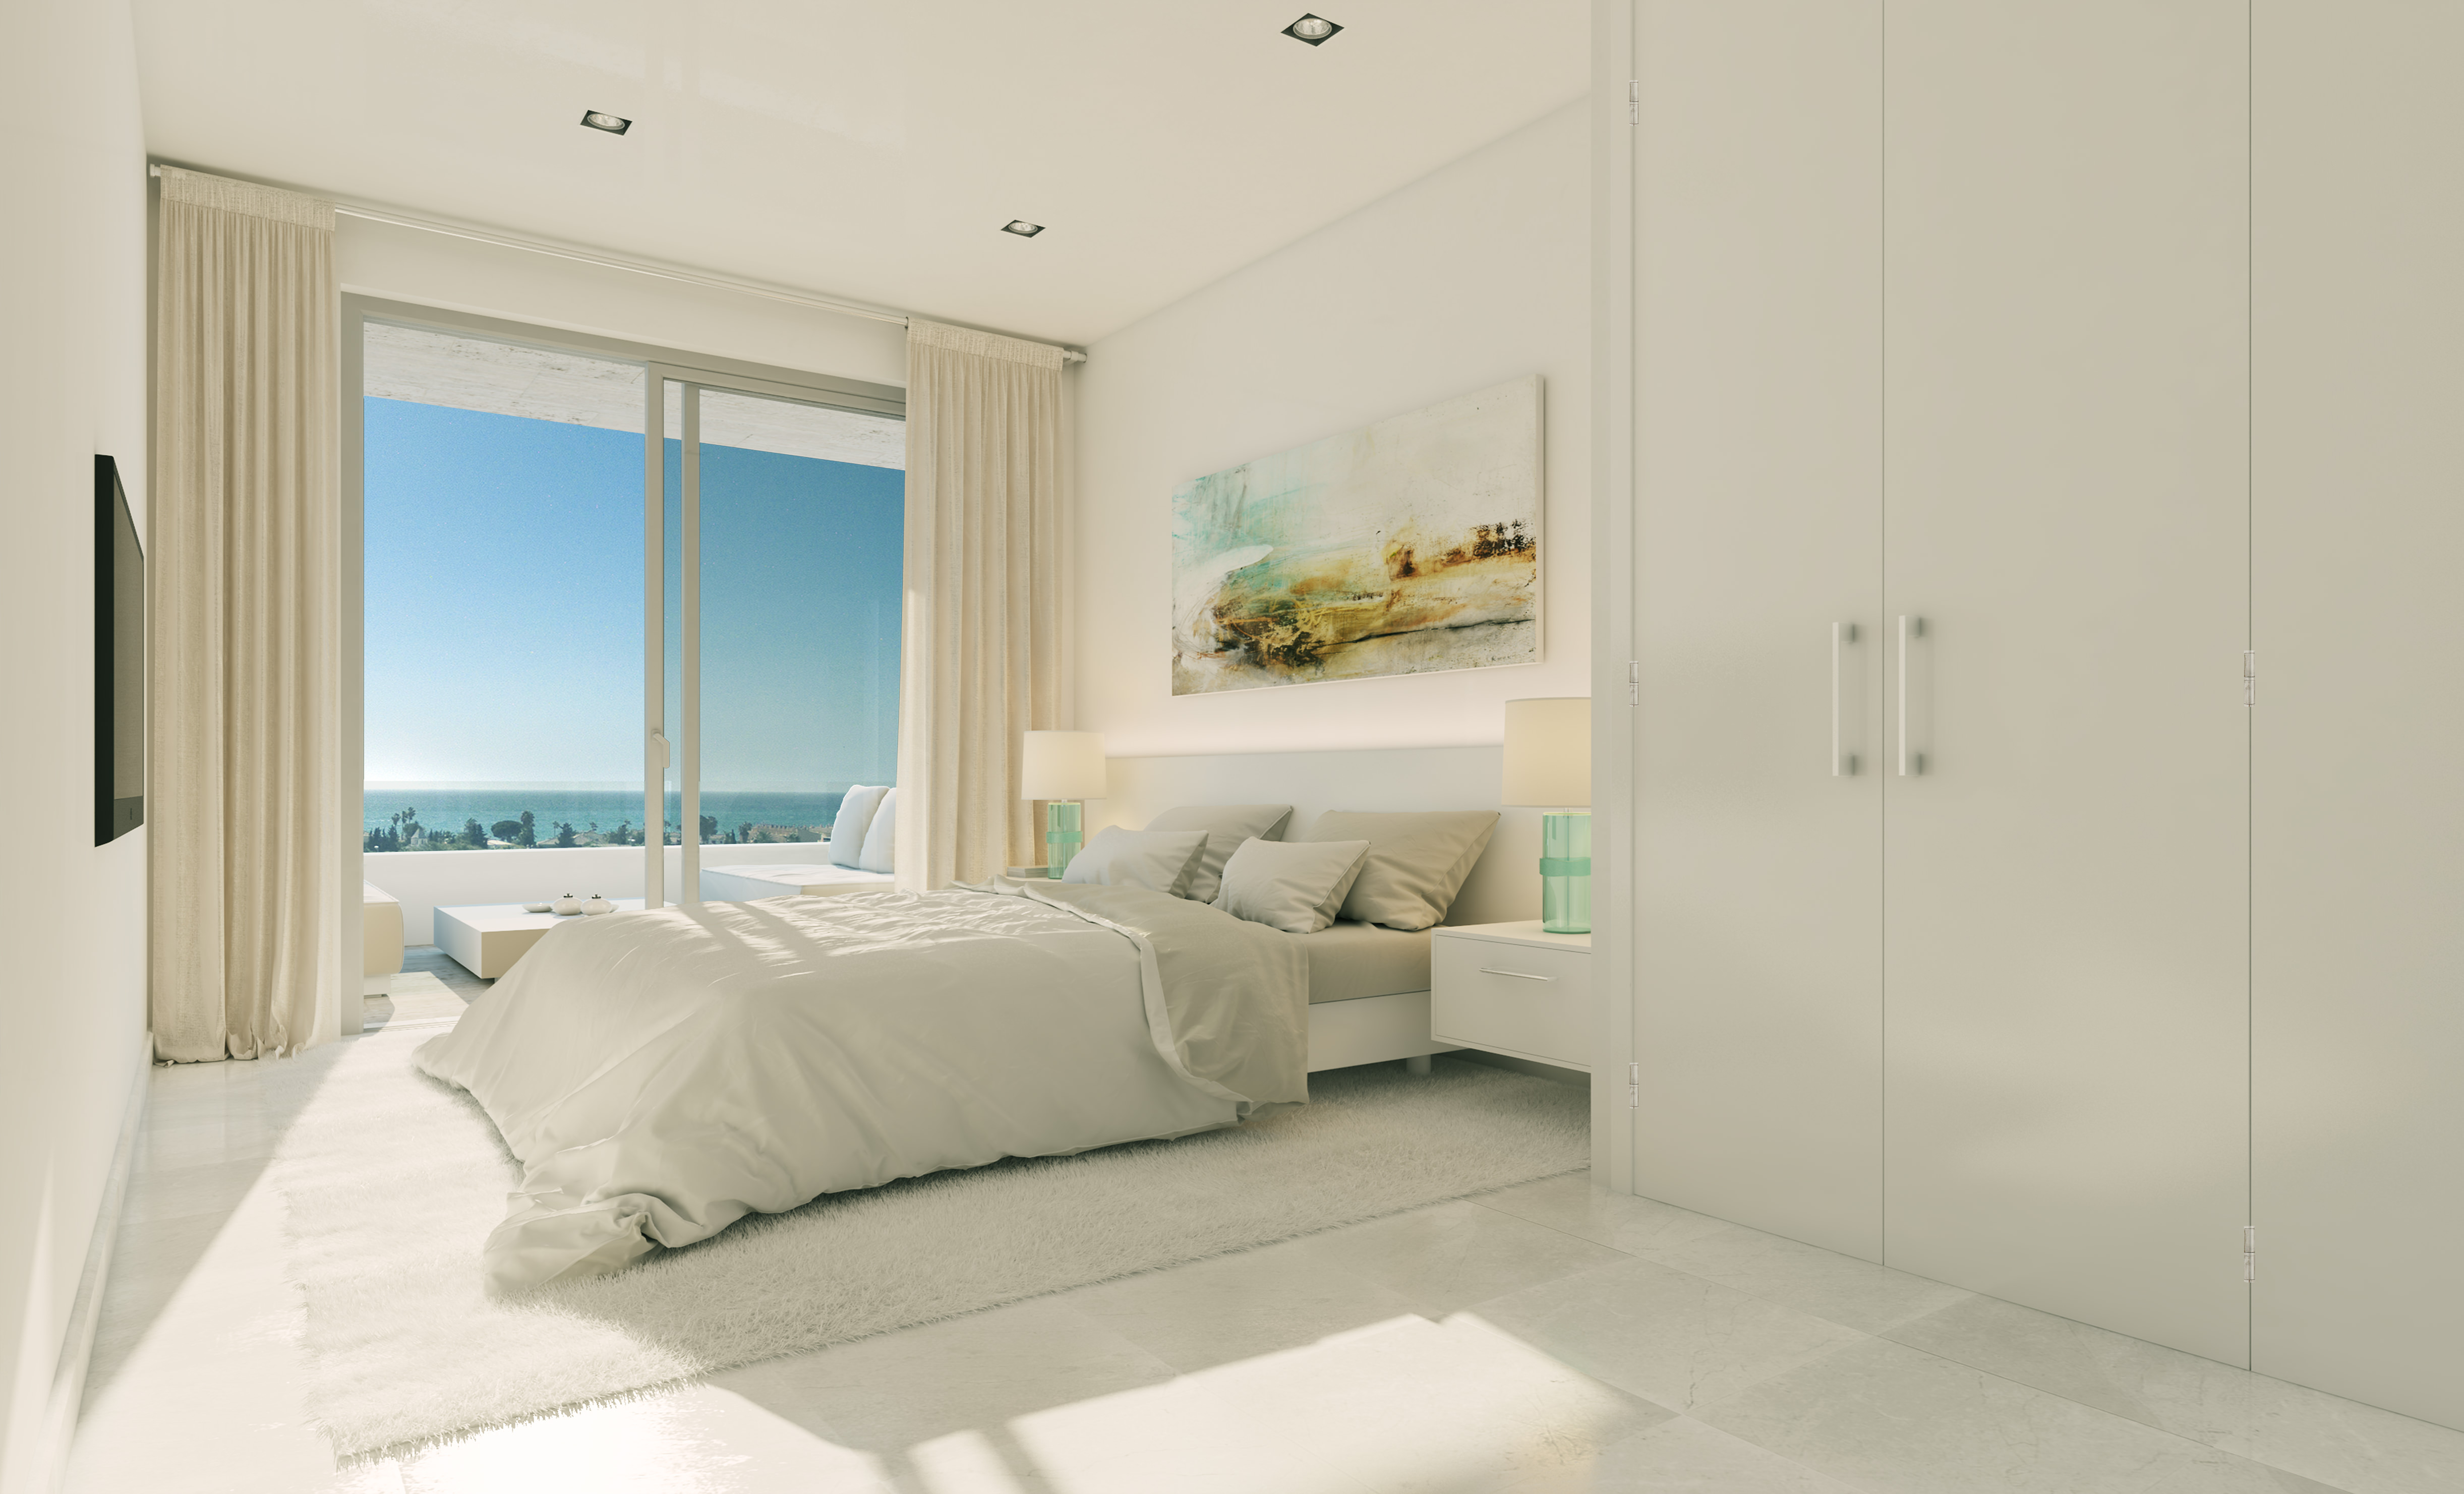 Marbella Bedroom Furniture New Ground Floor Apartment Belaire Estepona For Sale O Realista